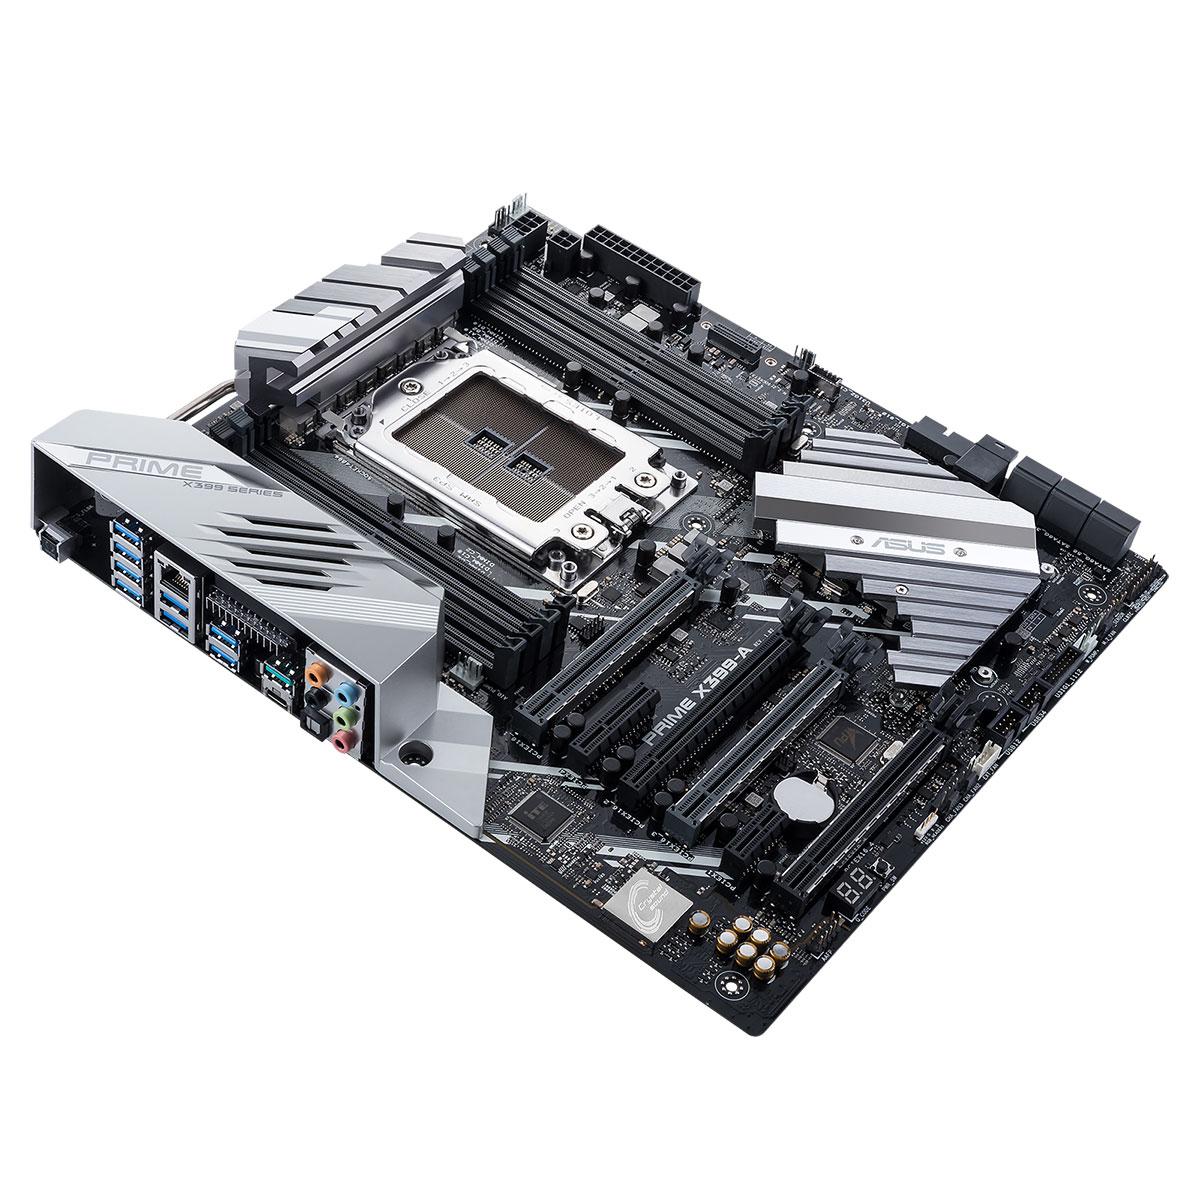 Carte mère ASUS PRIME X399-A Carte mère E-ATX Socket sTR4 AMD X399 - 8x DDR4 - SATA 6Gb/s + M.2 + U.2 - USB 3.1 - 4x PCI-Express 3.0 16x